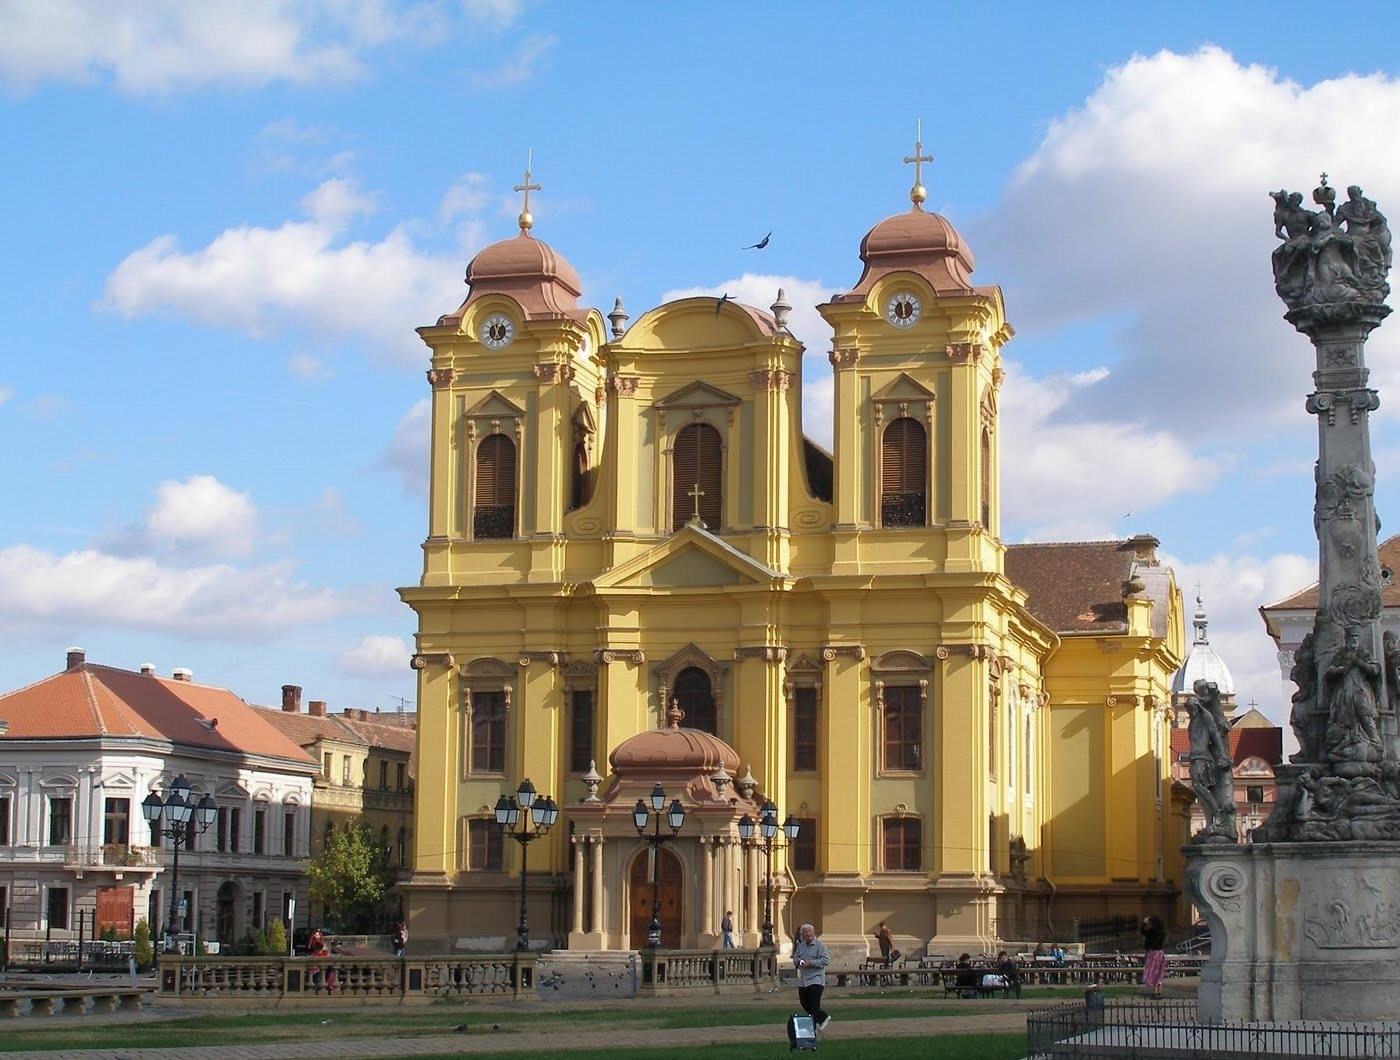 Olx Timisoara